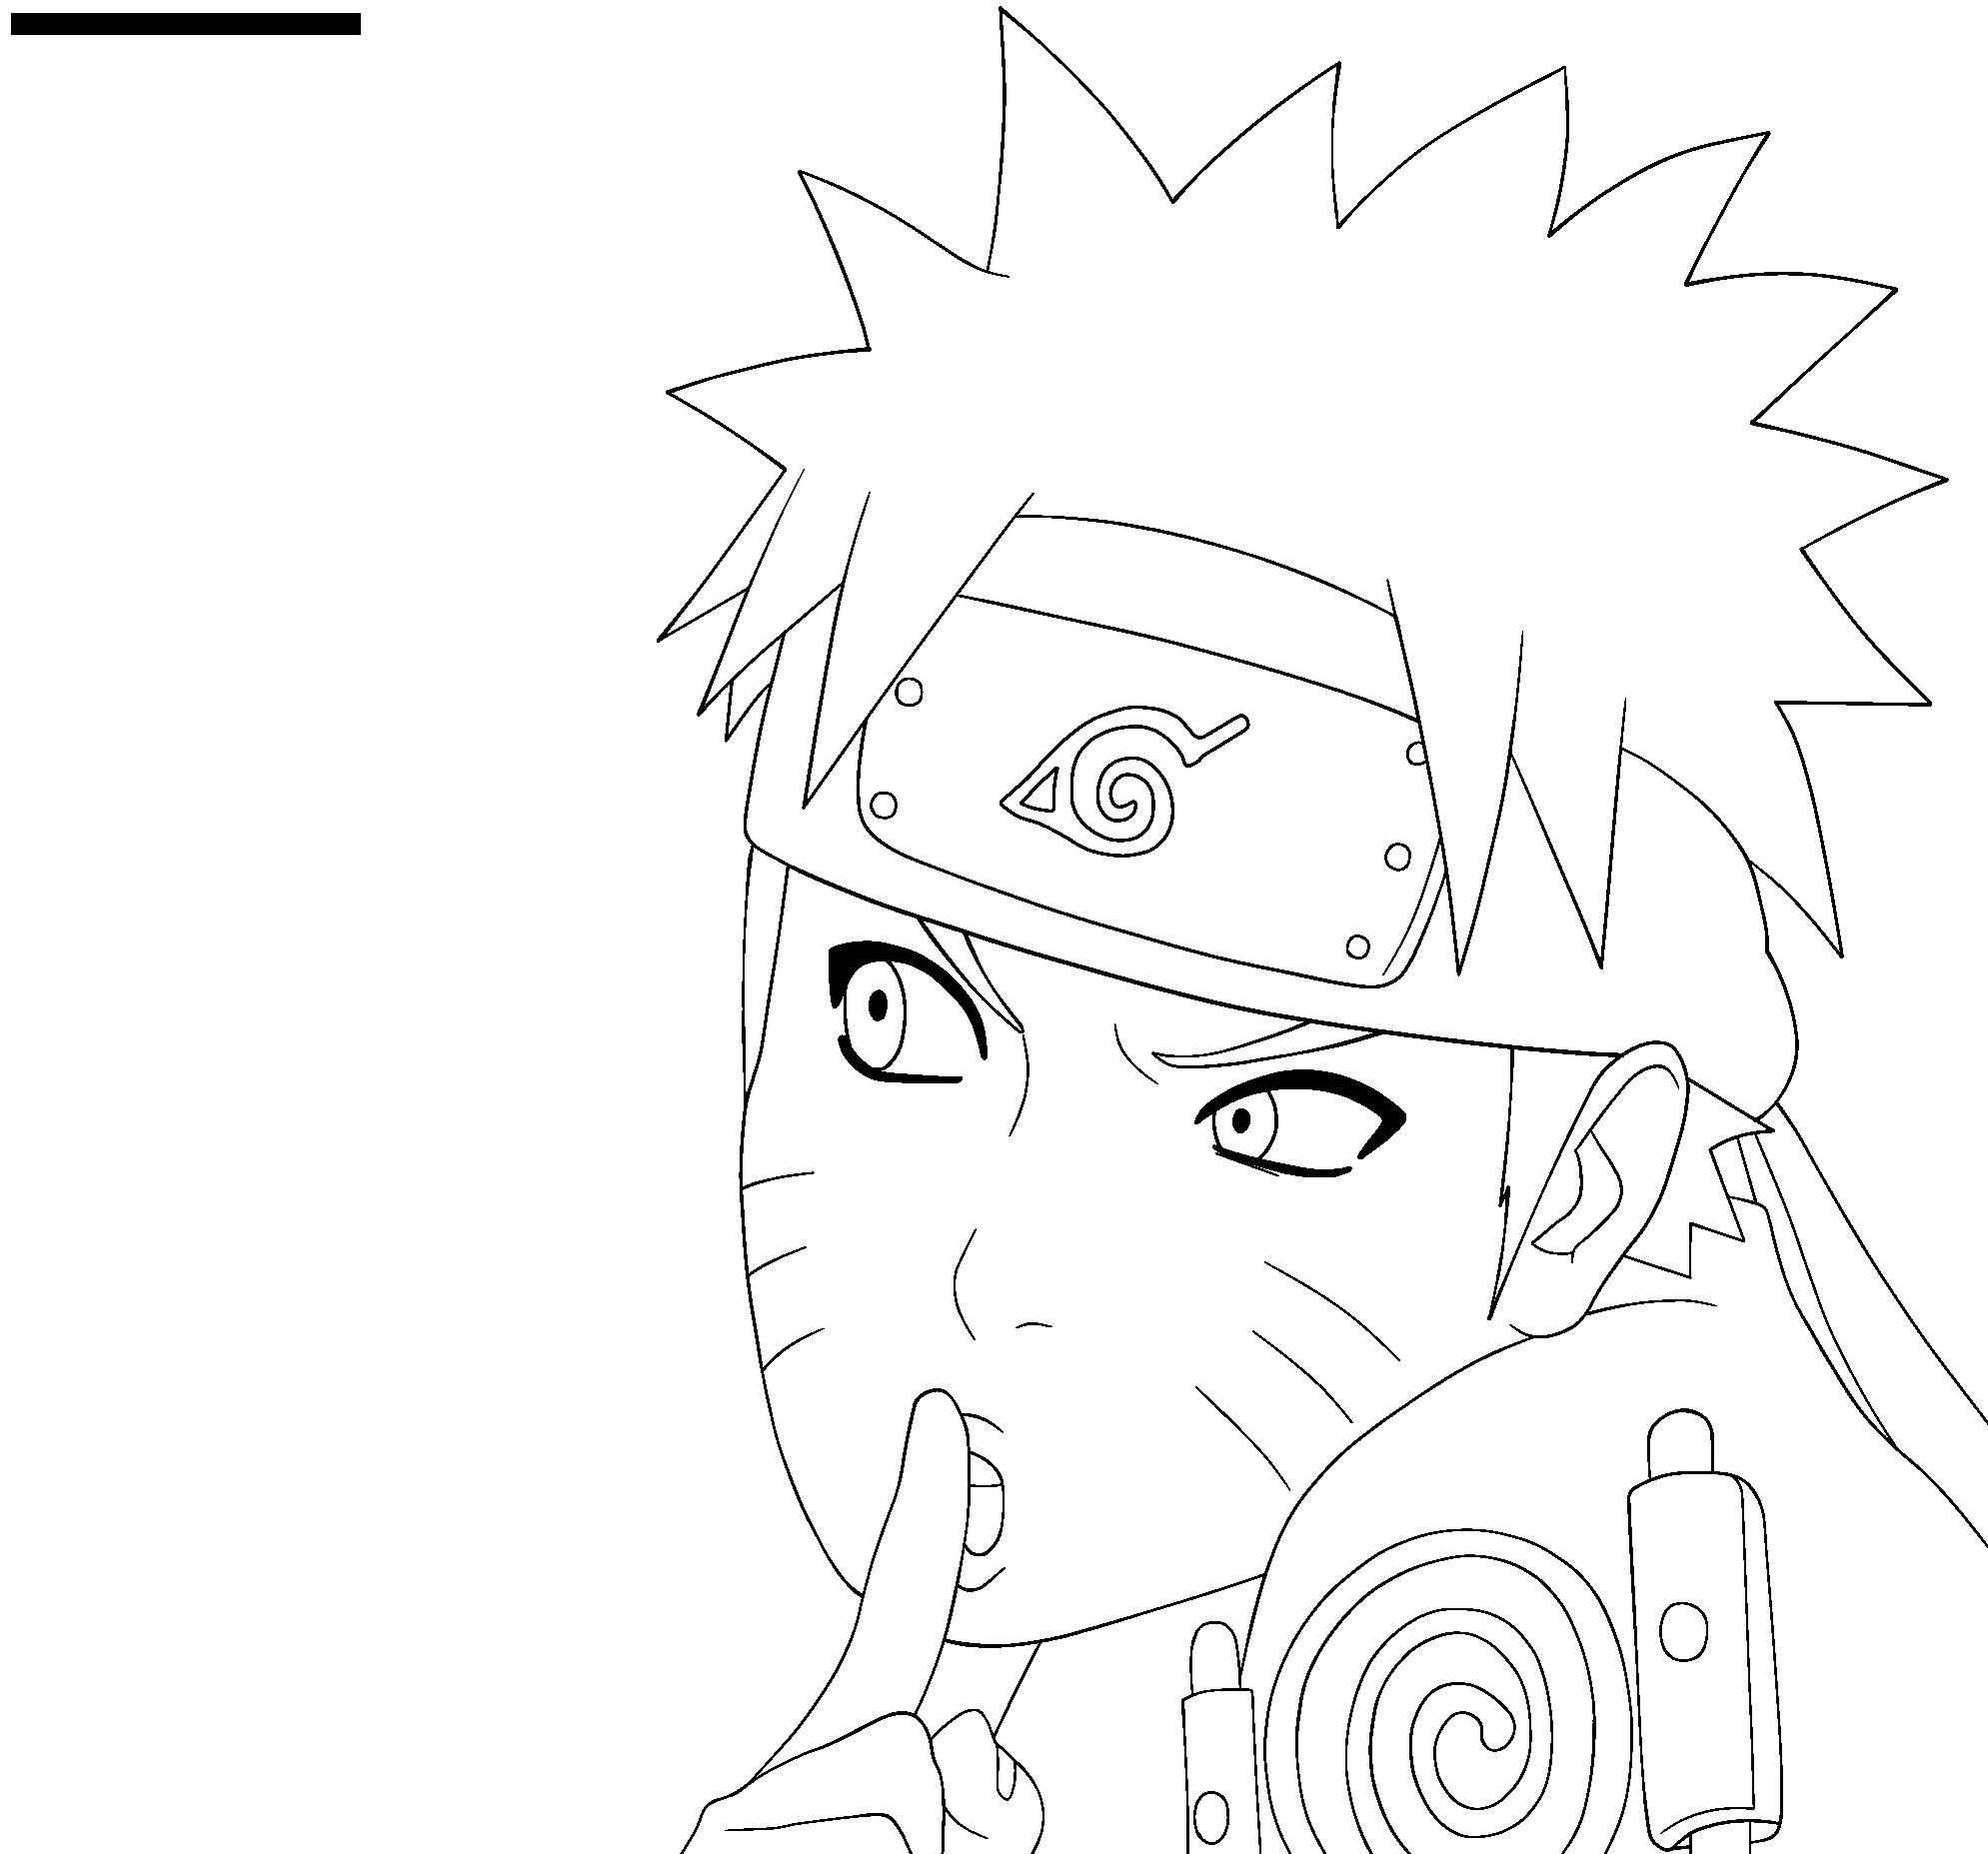 Lineart Naruto : Uzumaki naruto lineart by inferno on deviantart